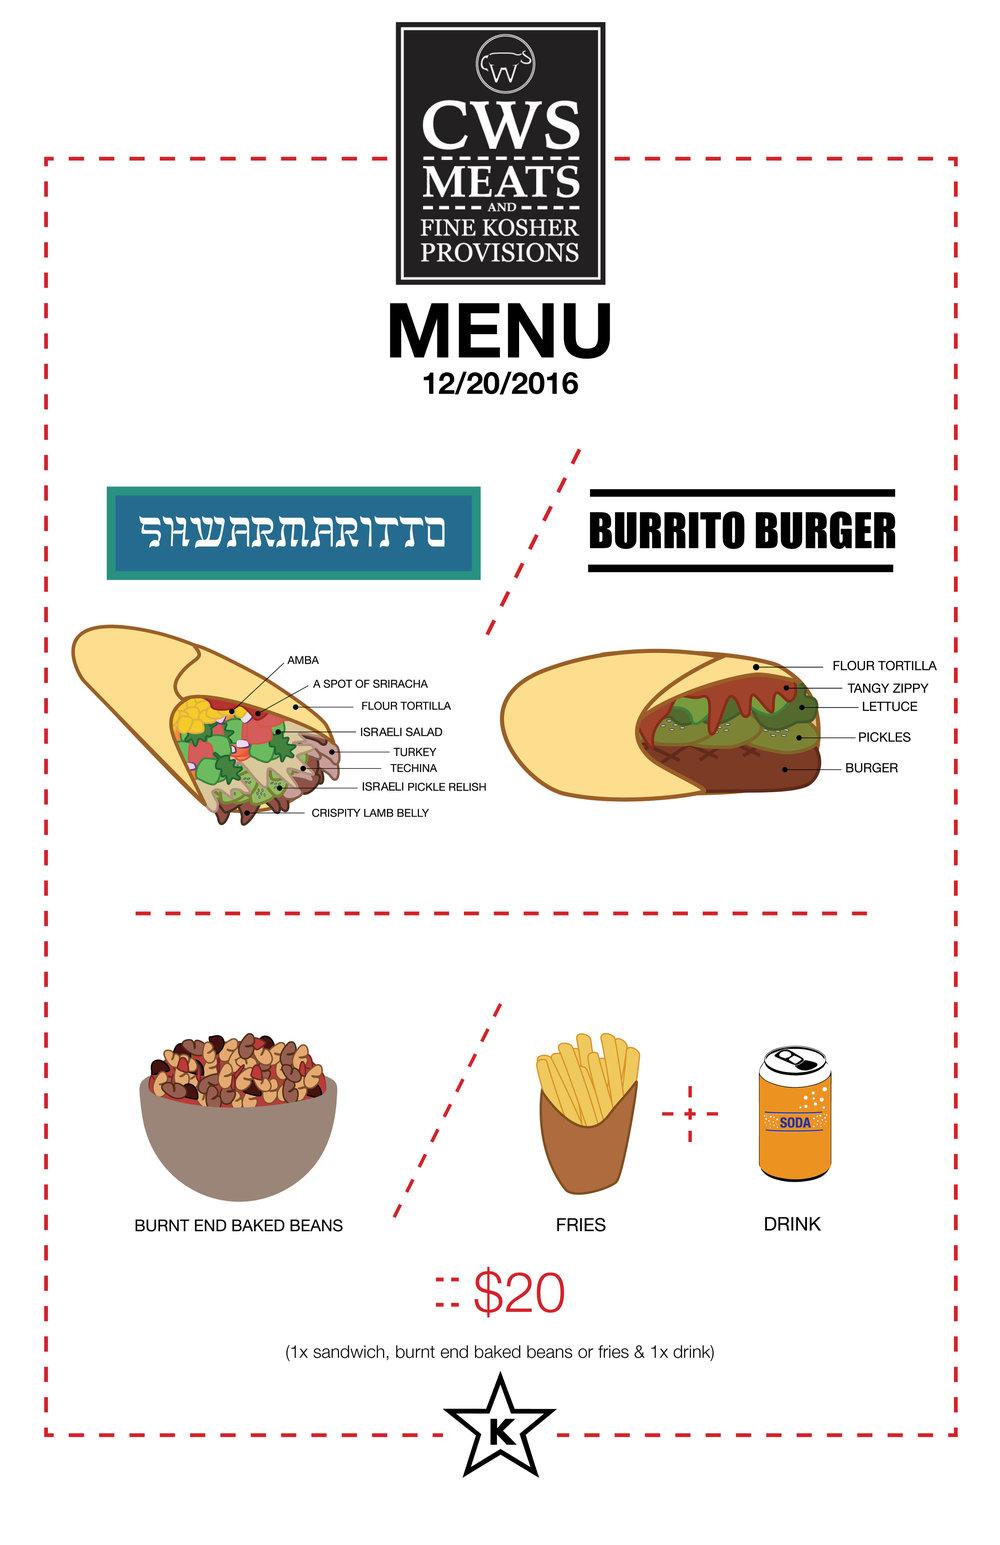 CWS menu 1/20